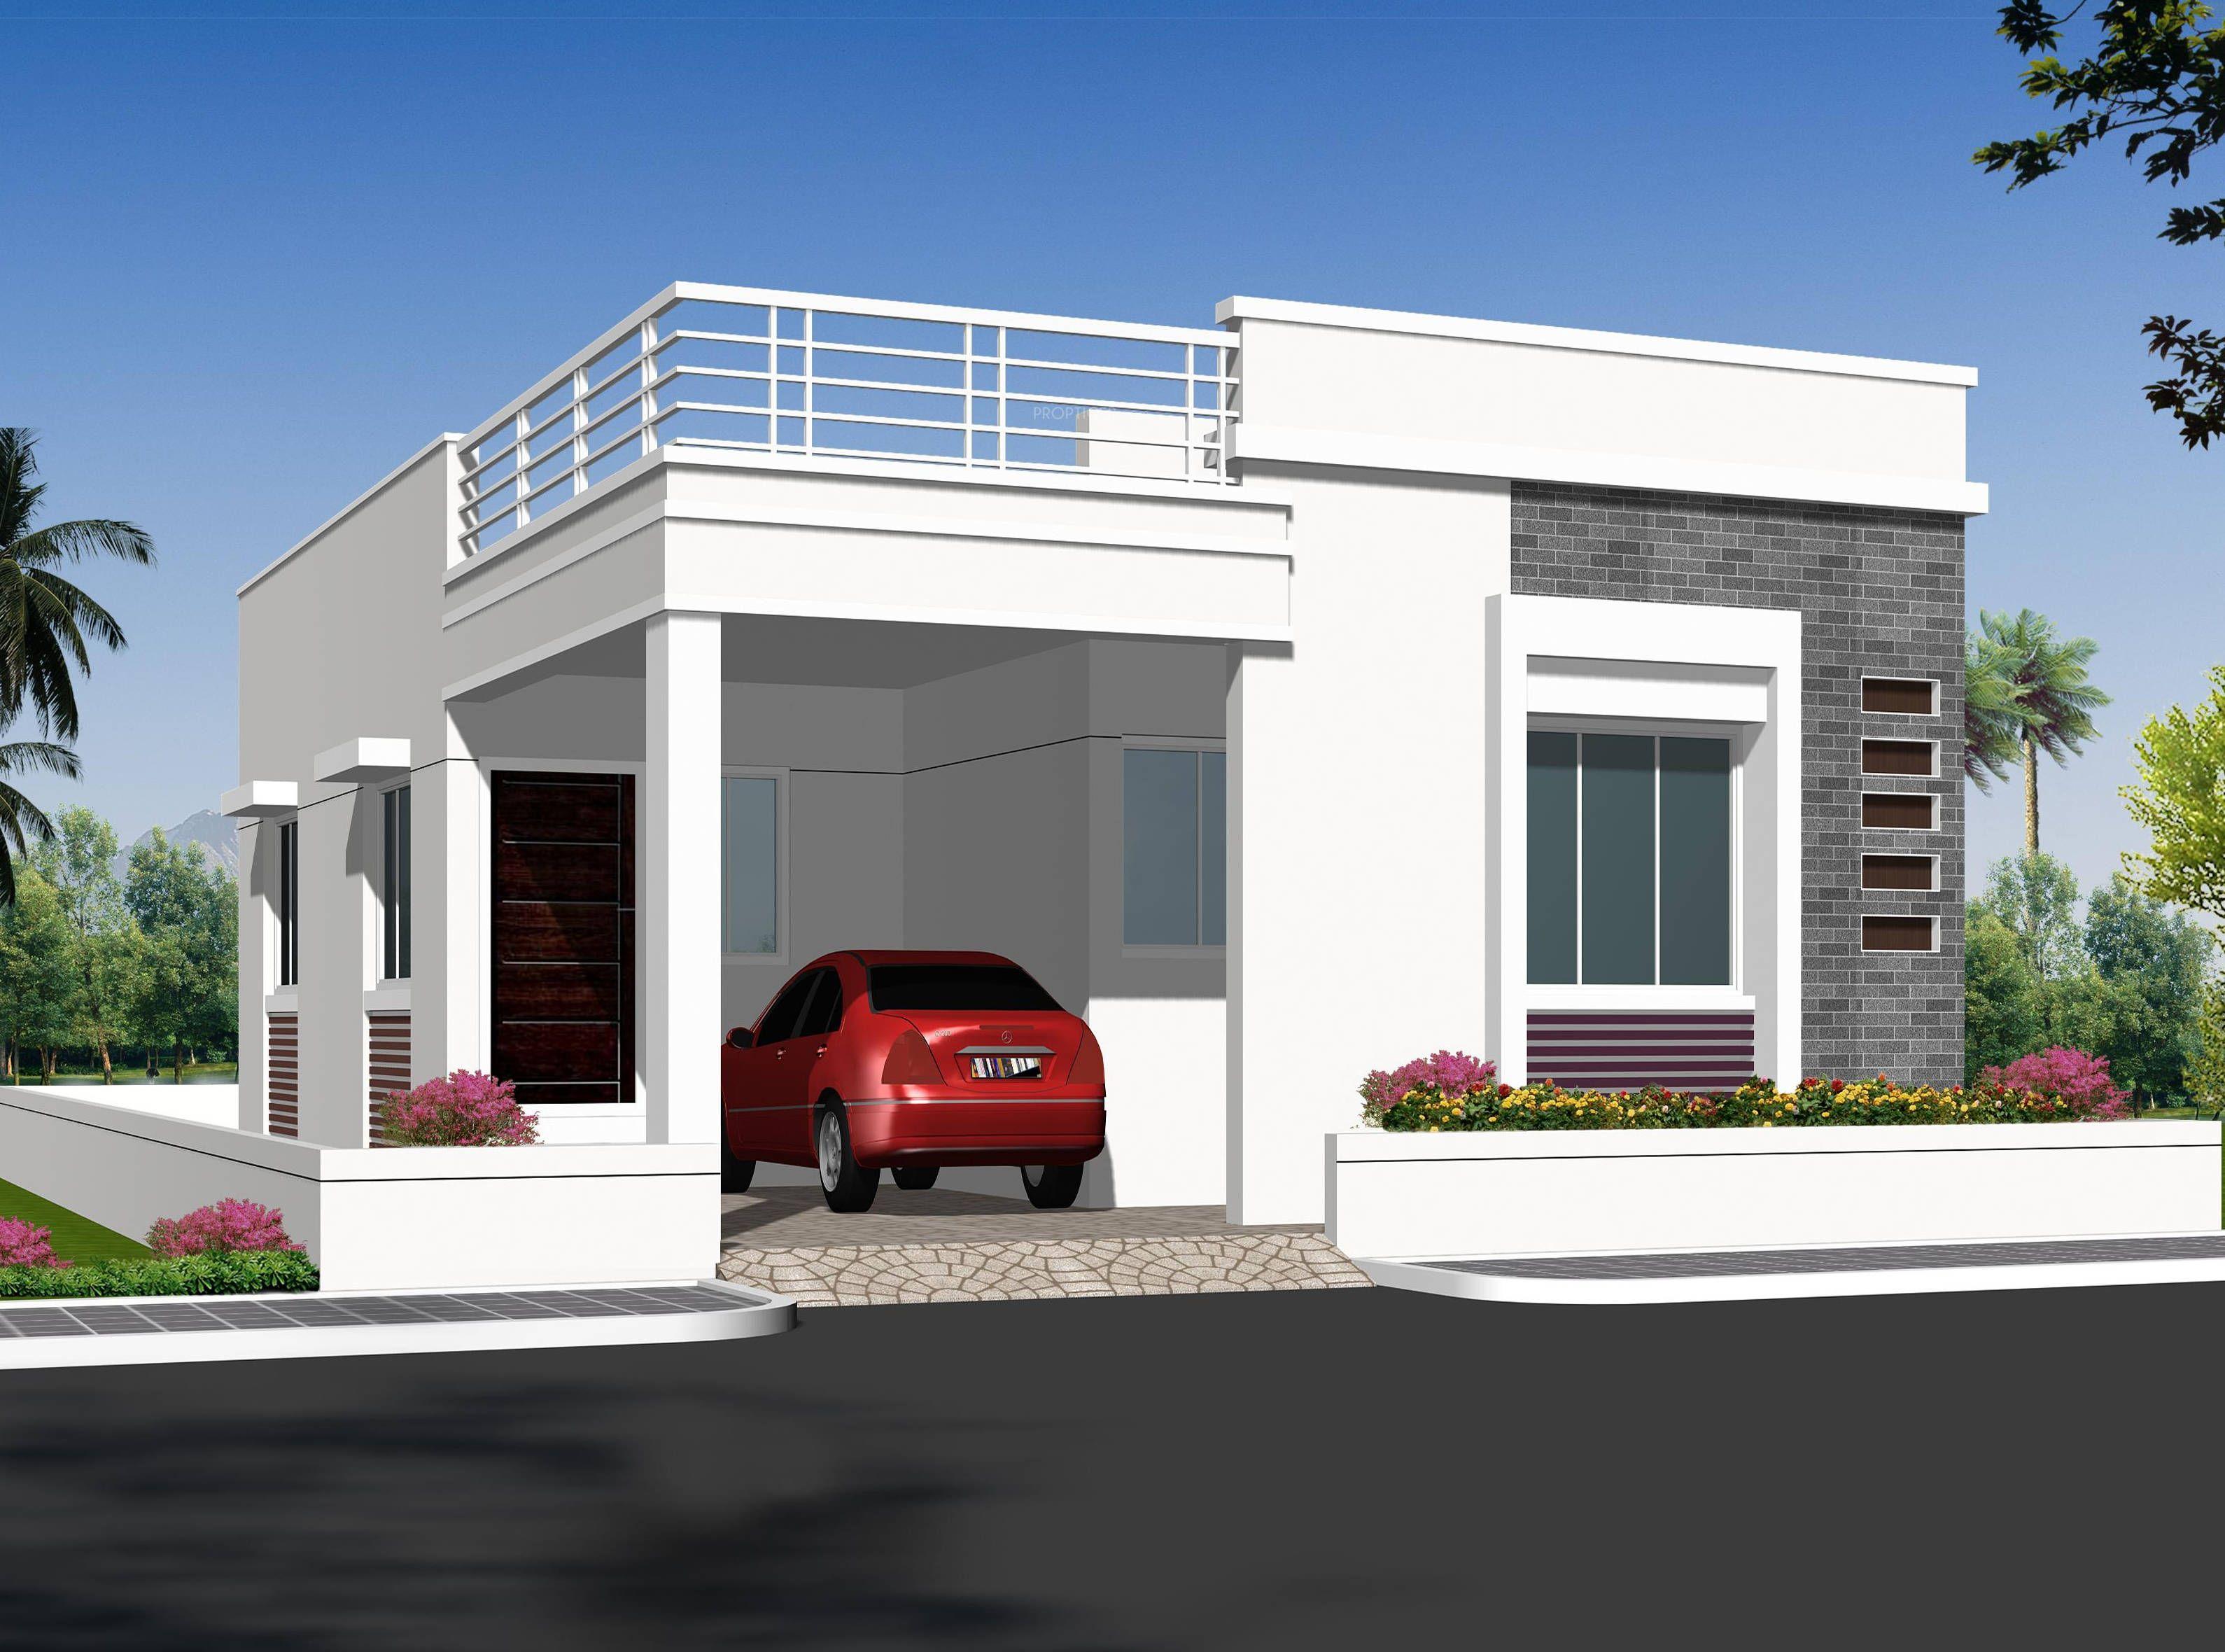 Imagen relacionada fachadas arquitectonicas pinterest for Independent house elevation photos